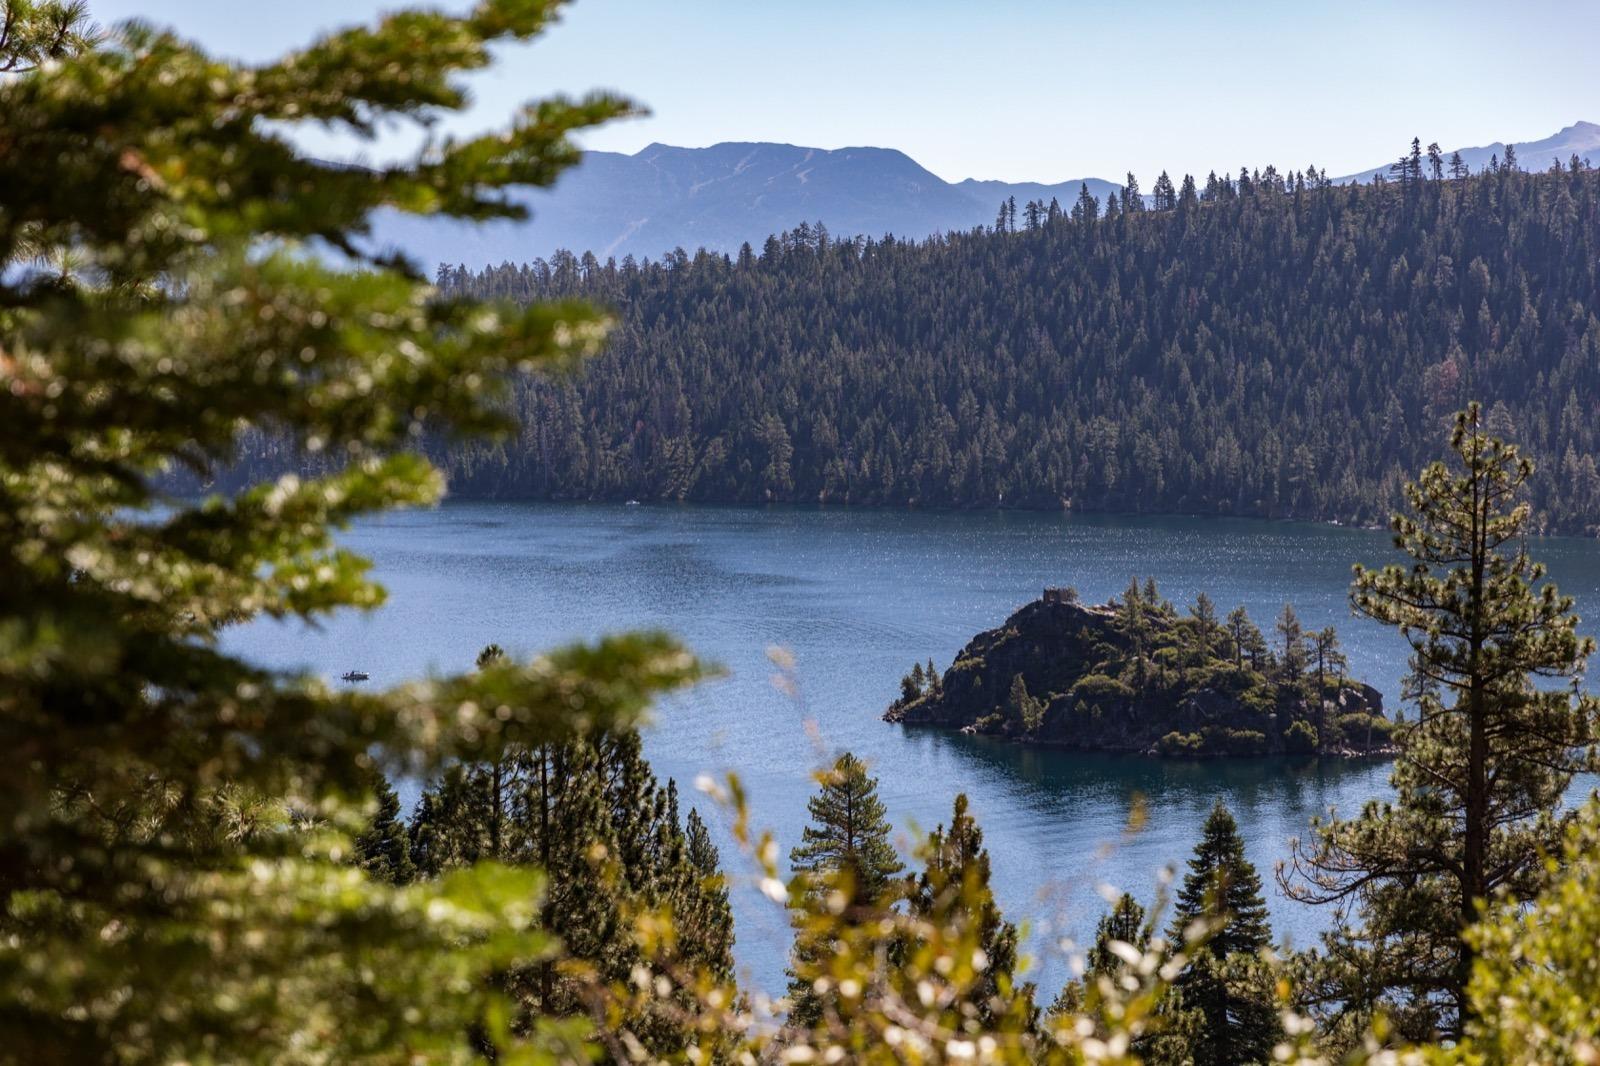 california-high-sierra-south-lake-tahoe-emerald-bay-2